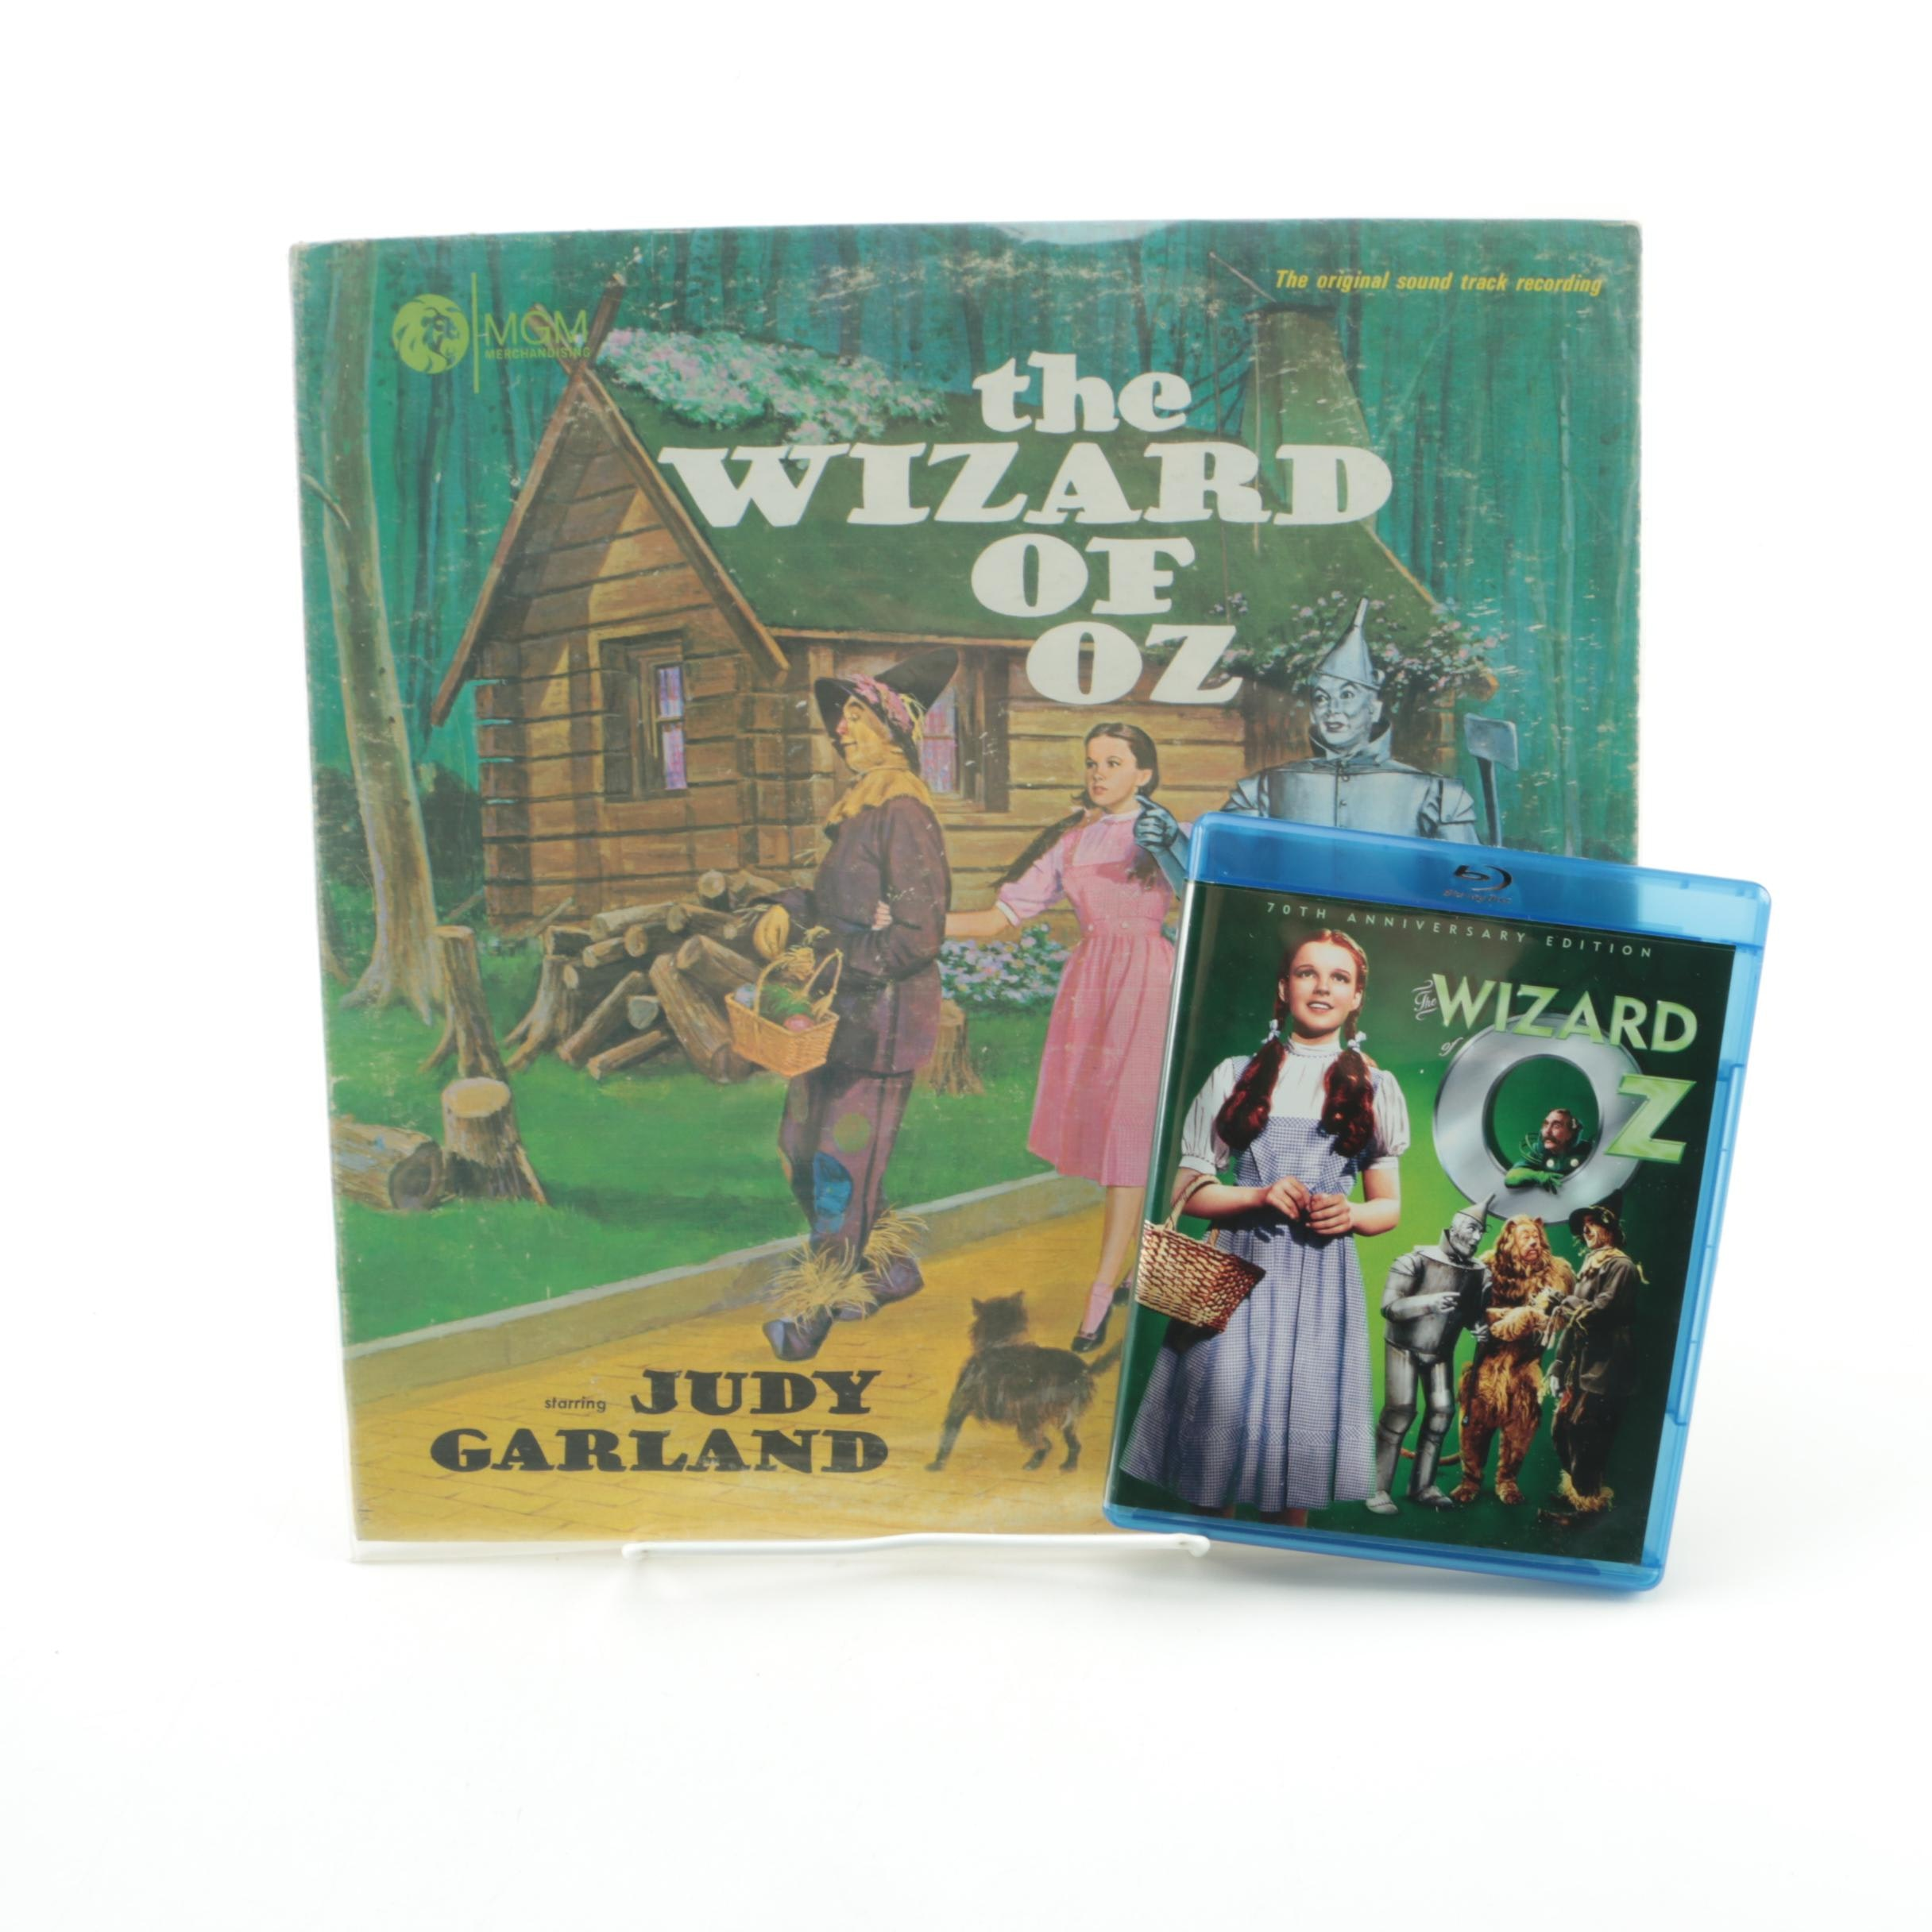 """The Wizard Of Oz"" Original Soundtrack Record and 70th Anniversary Blu-Ray"